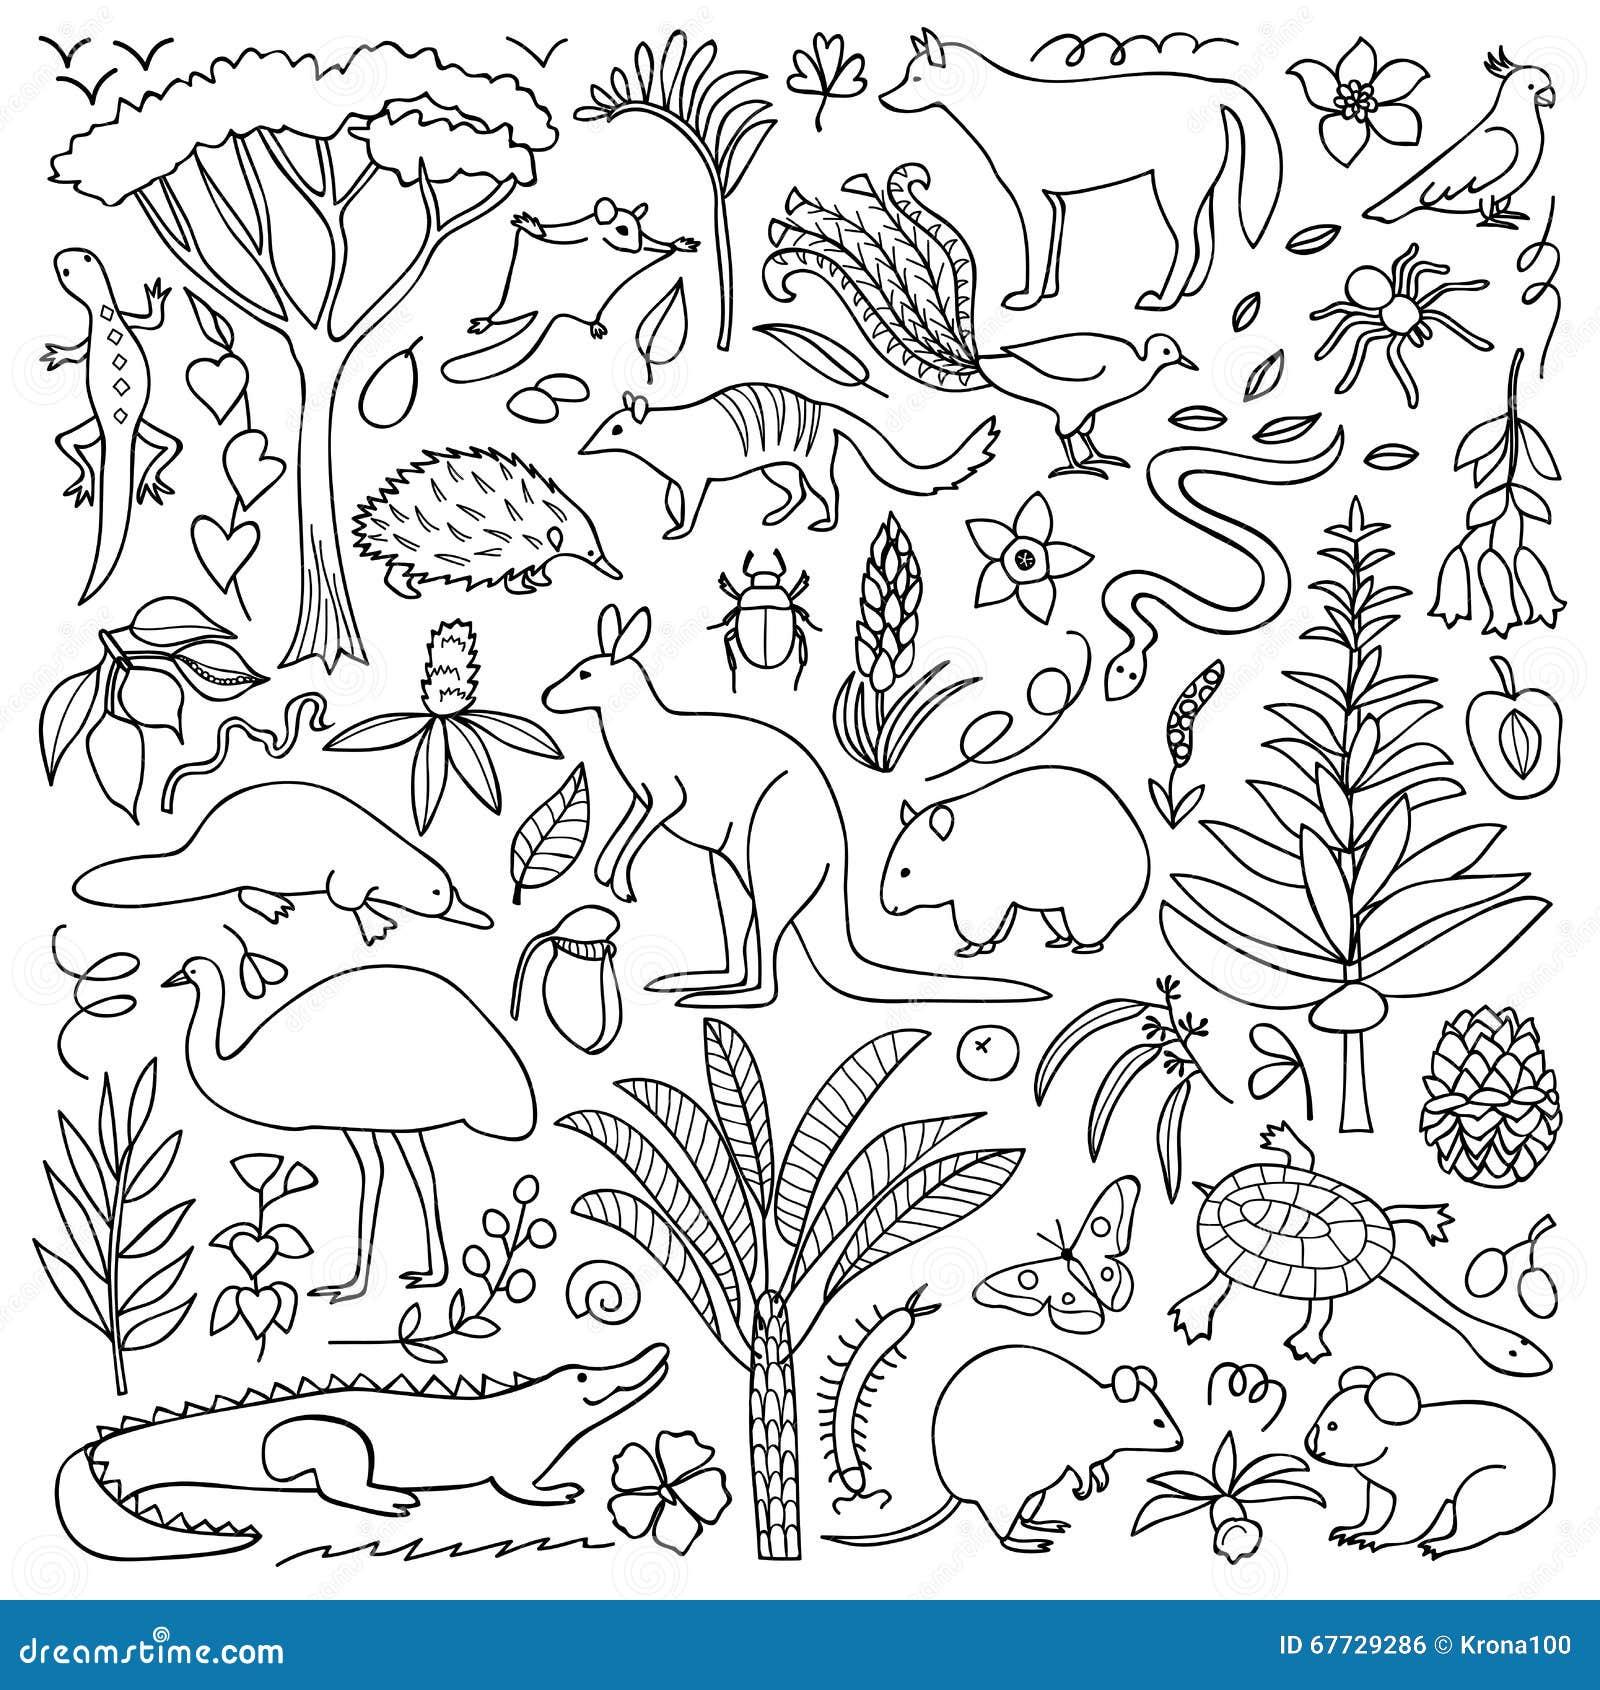 Echidna Stock Illustrations   Echidna Stock Illustrations - Map of us drawn by australian